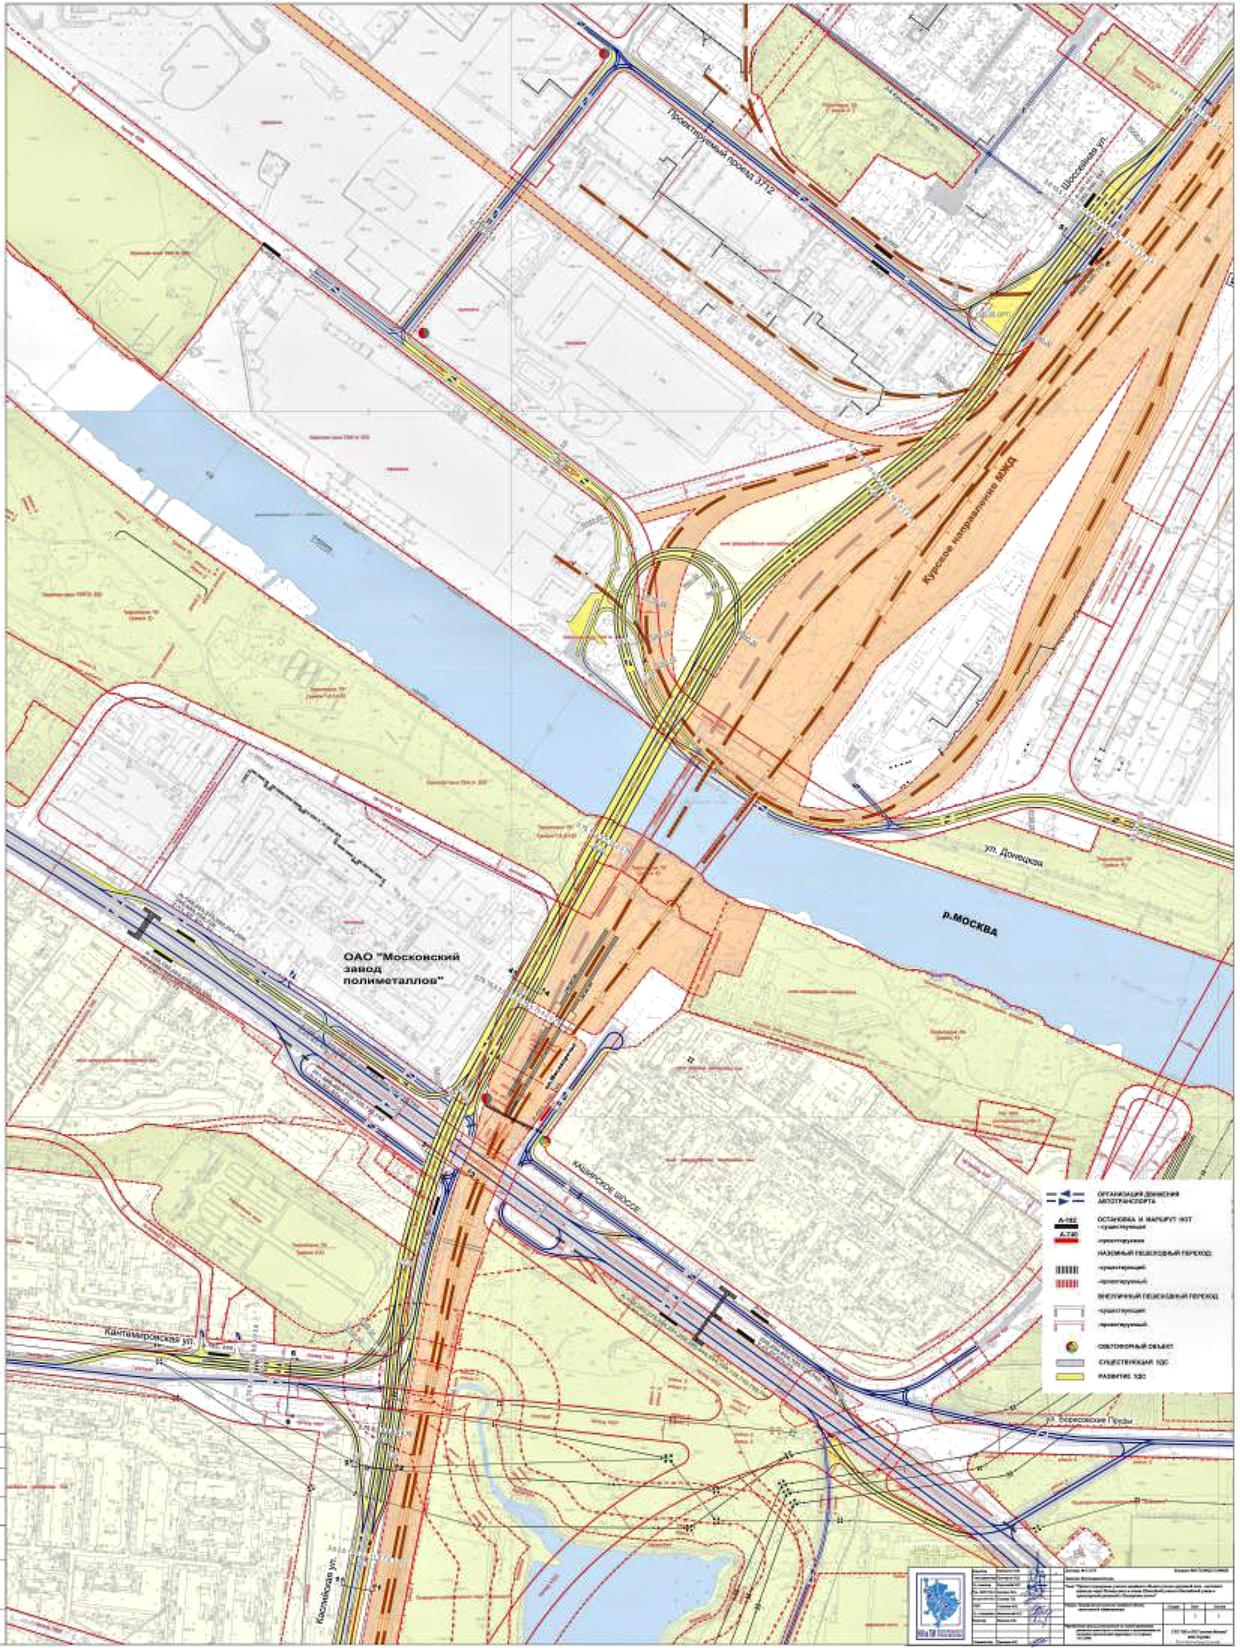 схема движения на развязке шоссе энтузиастов